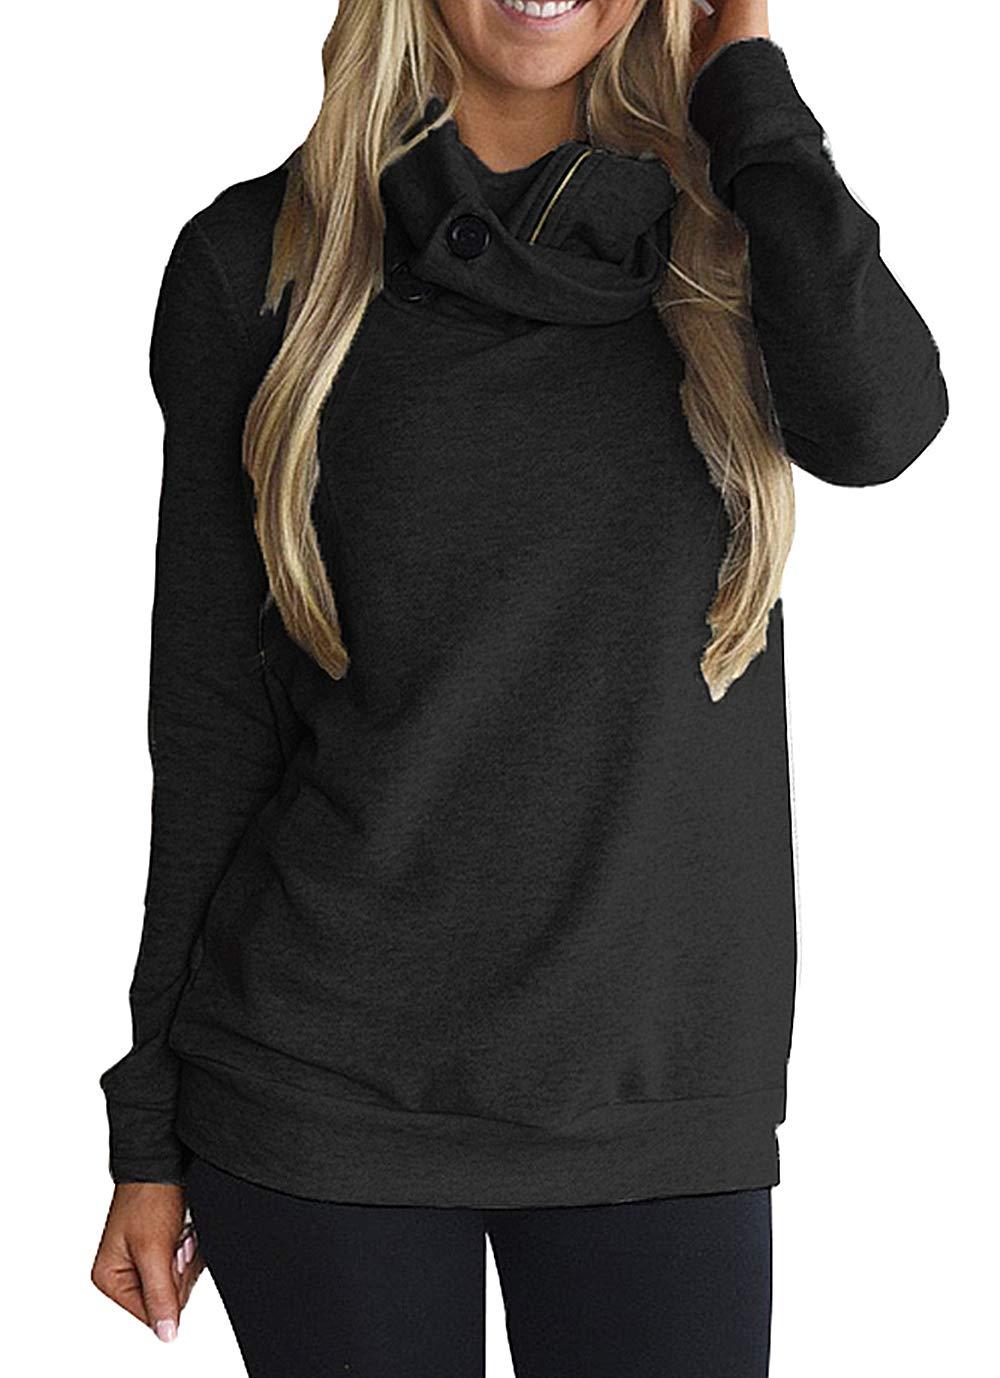 Happy Sailed Women Long Sleeve Button Zipper Cowl Neck Fleece Pullover Hoodie Sweatshirts Tops X-Large Black